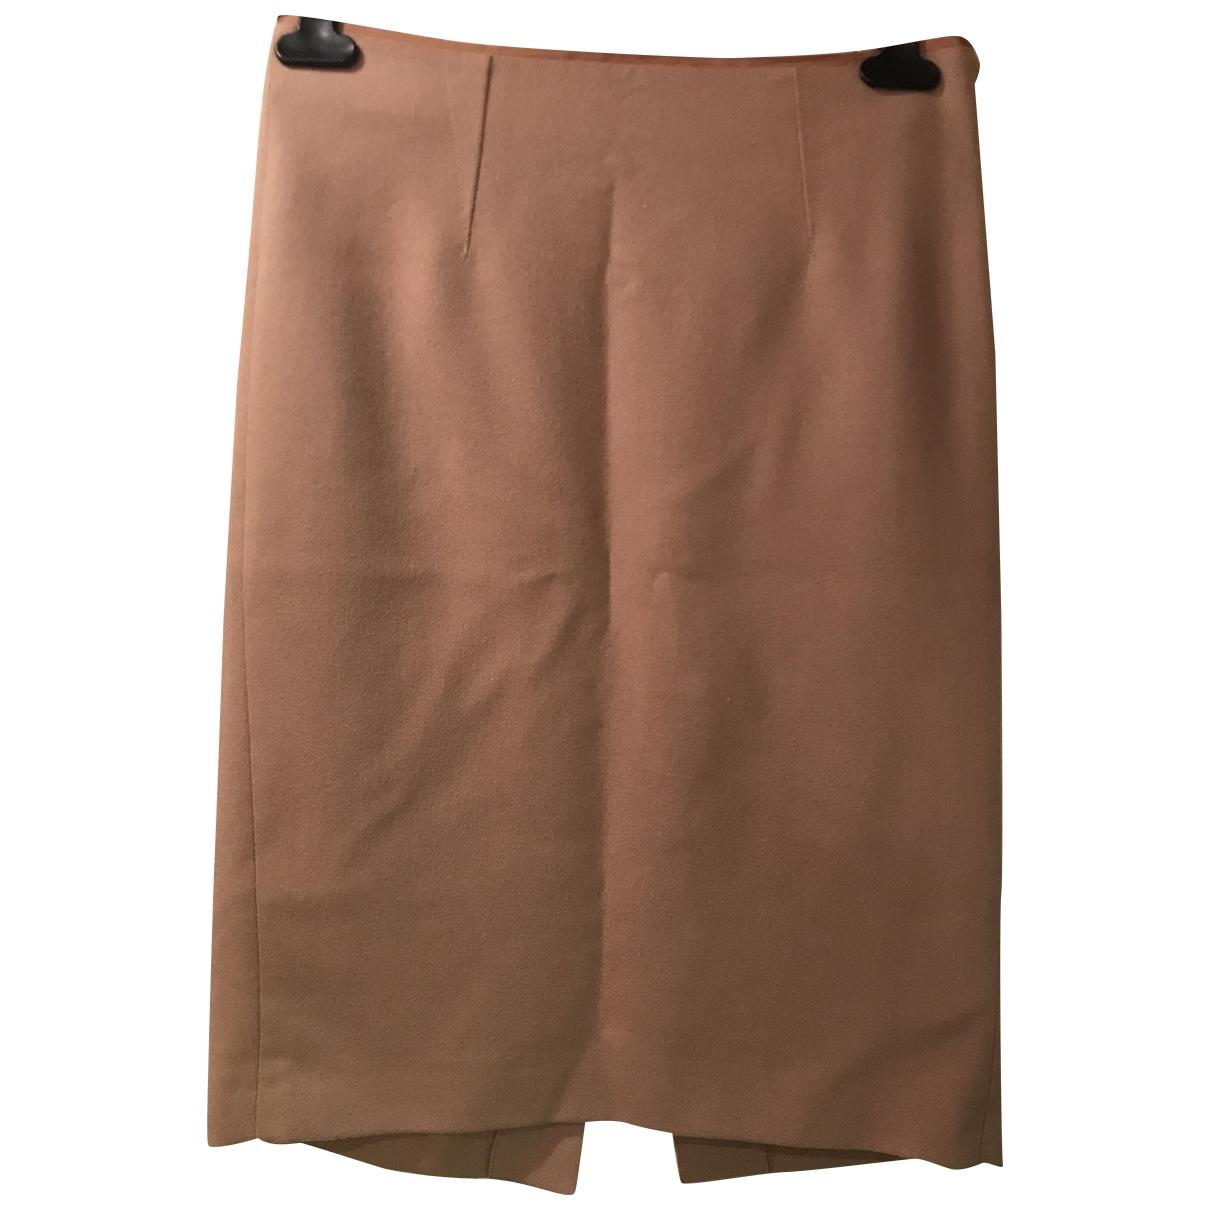 Mauro Grifoni \N Beige Wool skirt for Women 42 IT